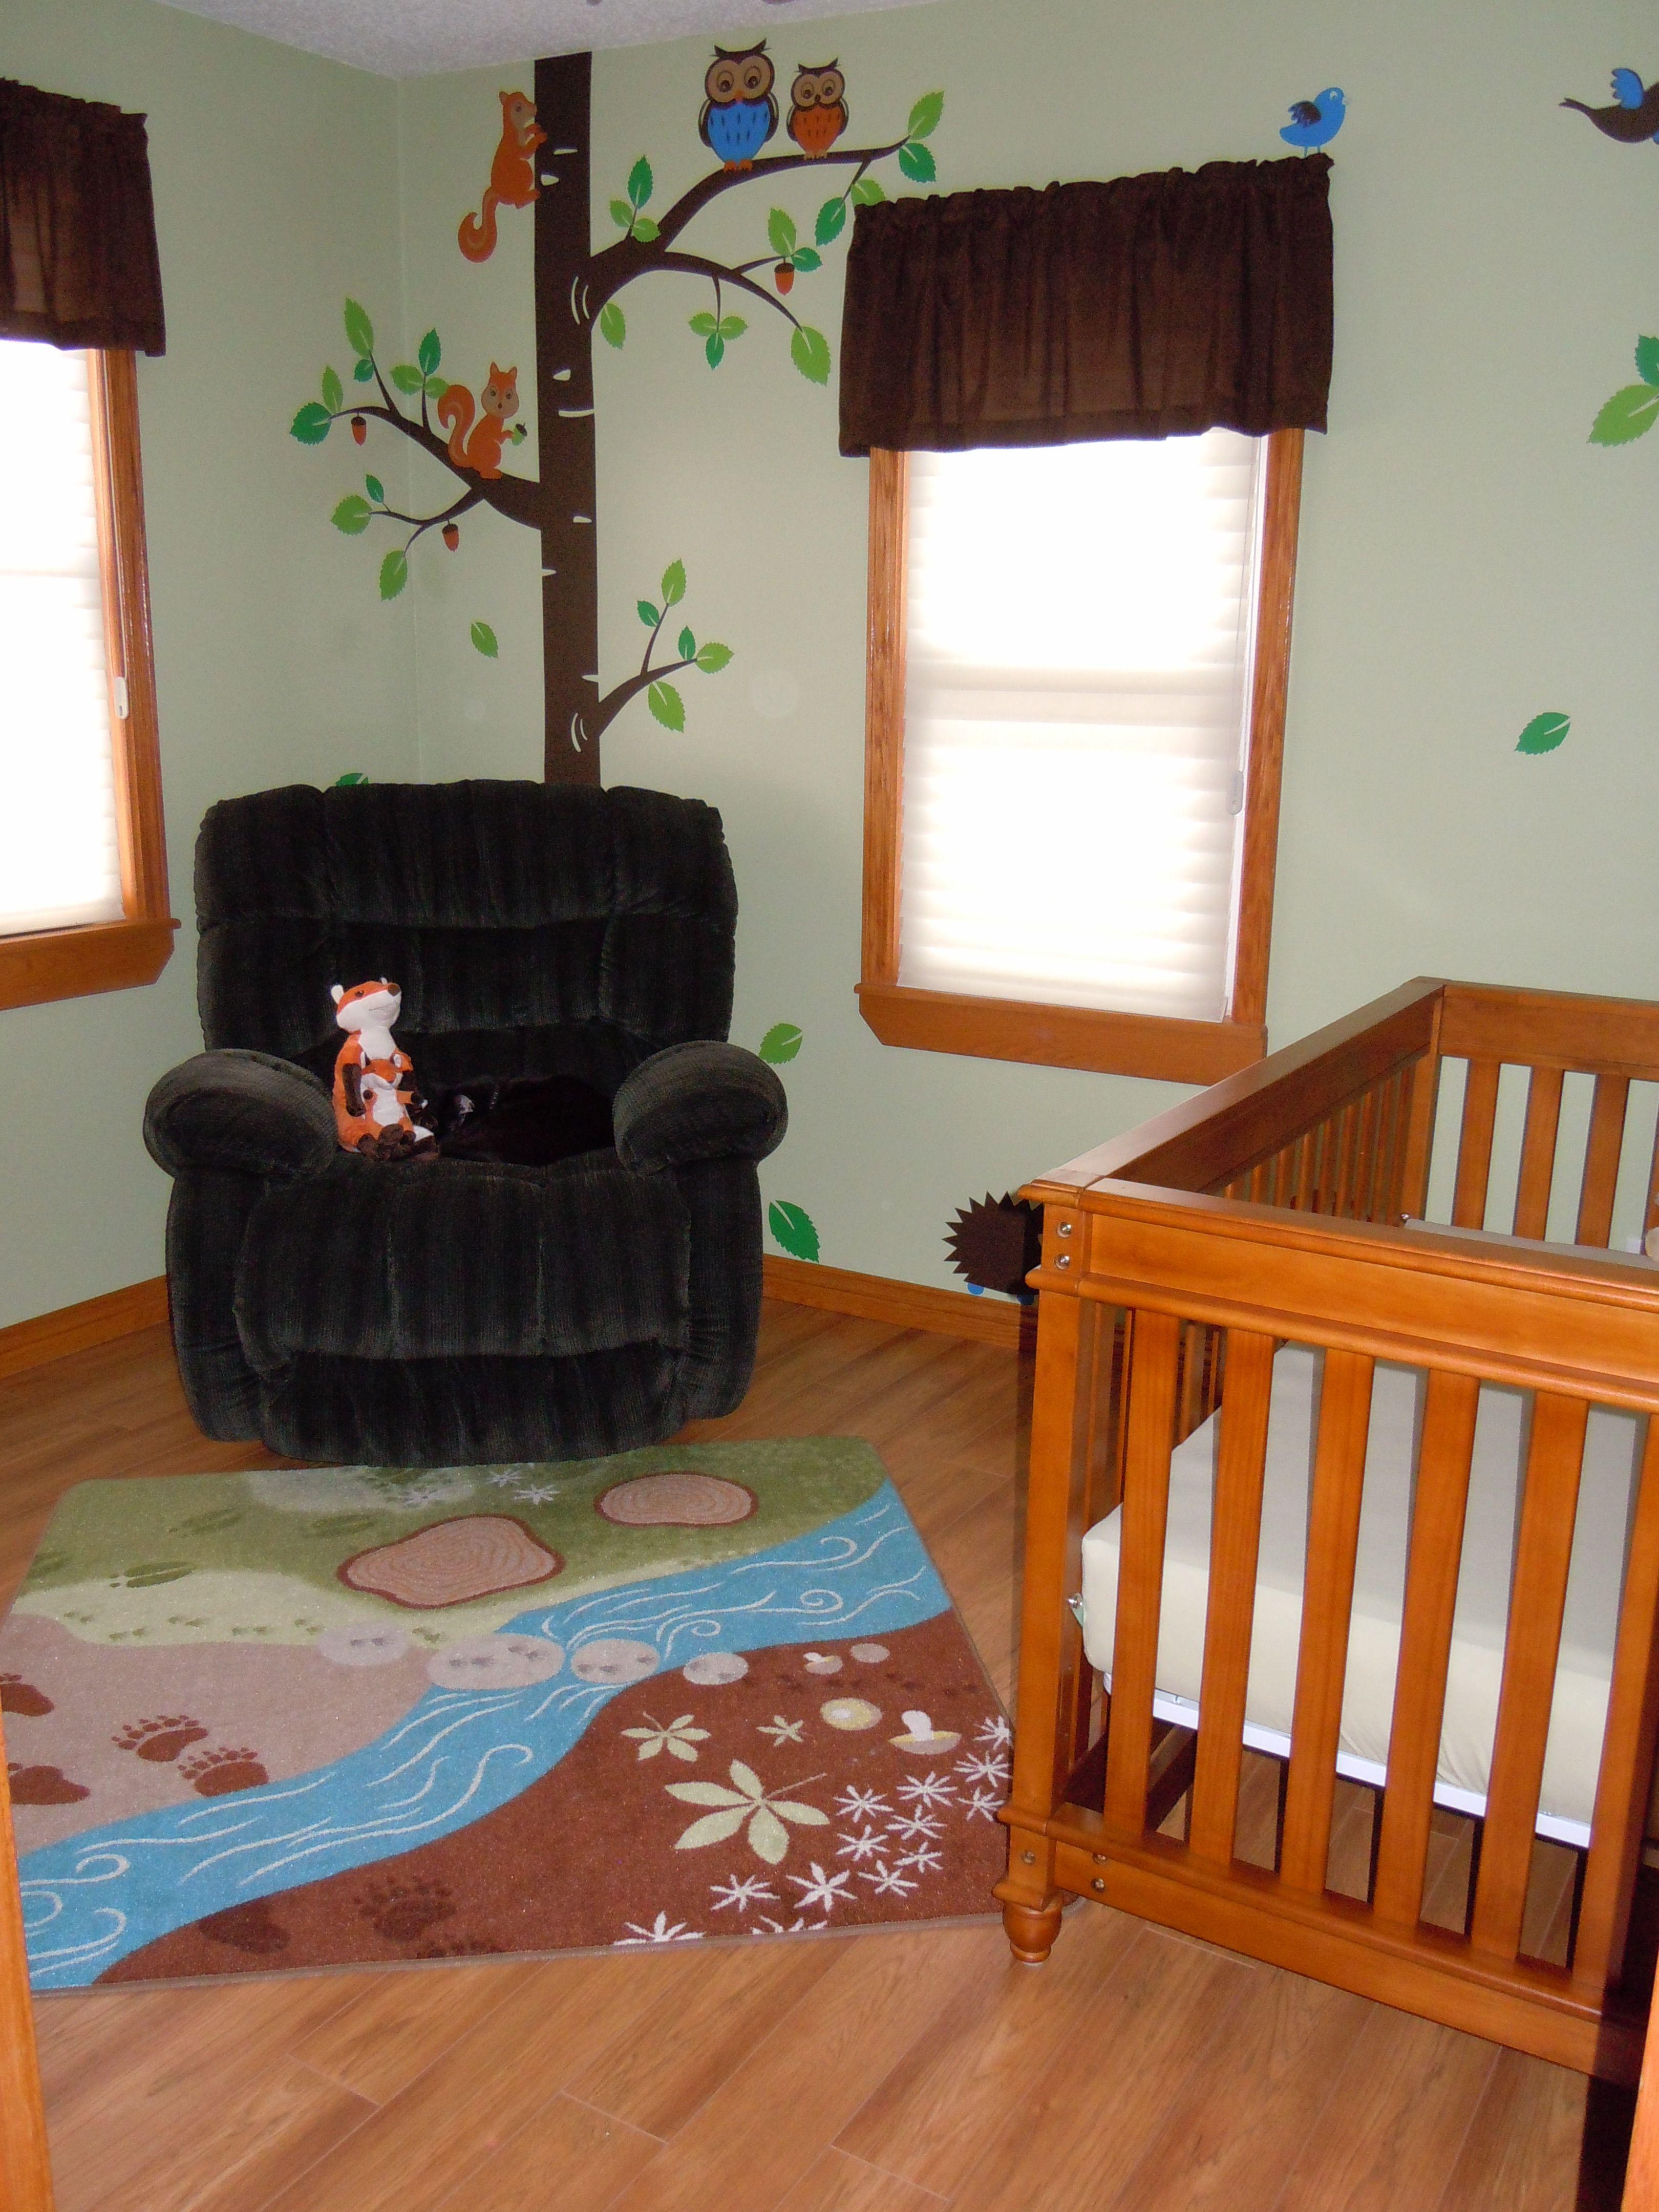 Europa Crib : europa, Woodland/forest, Animals, Nursery, Rug-IKEA, Decals-, Artfire.com-Smileywalls, Crib-, Europa, Palisad…, Animal, Rugs,, Theme,, Bedroom